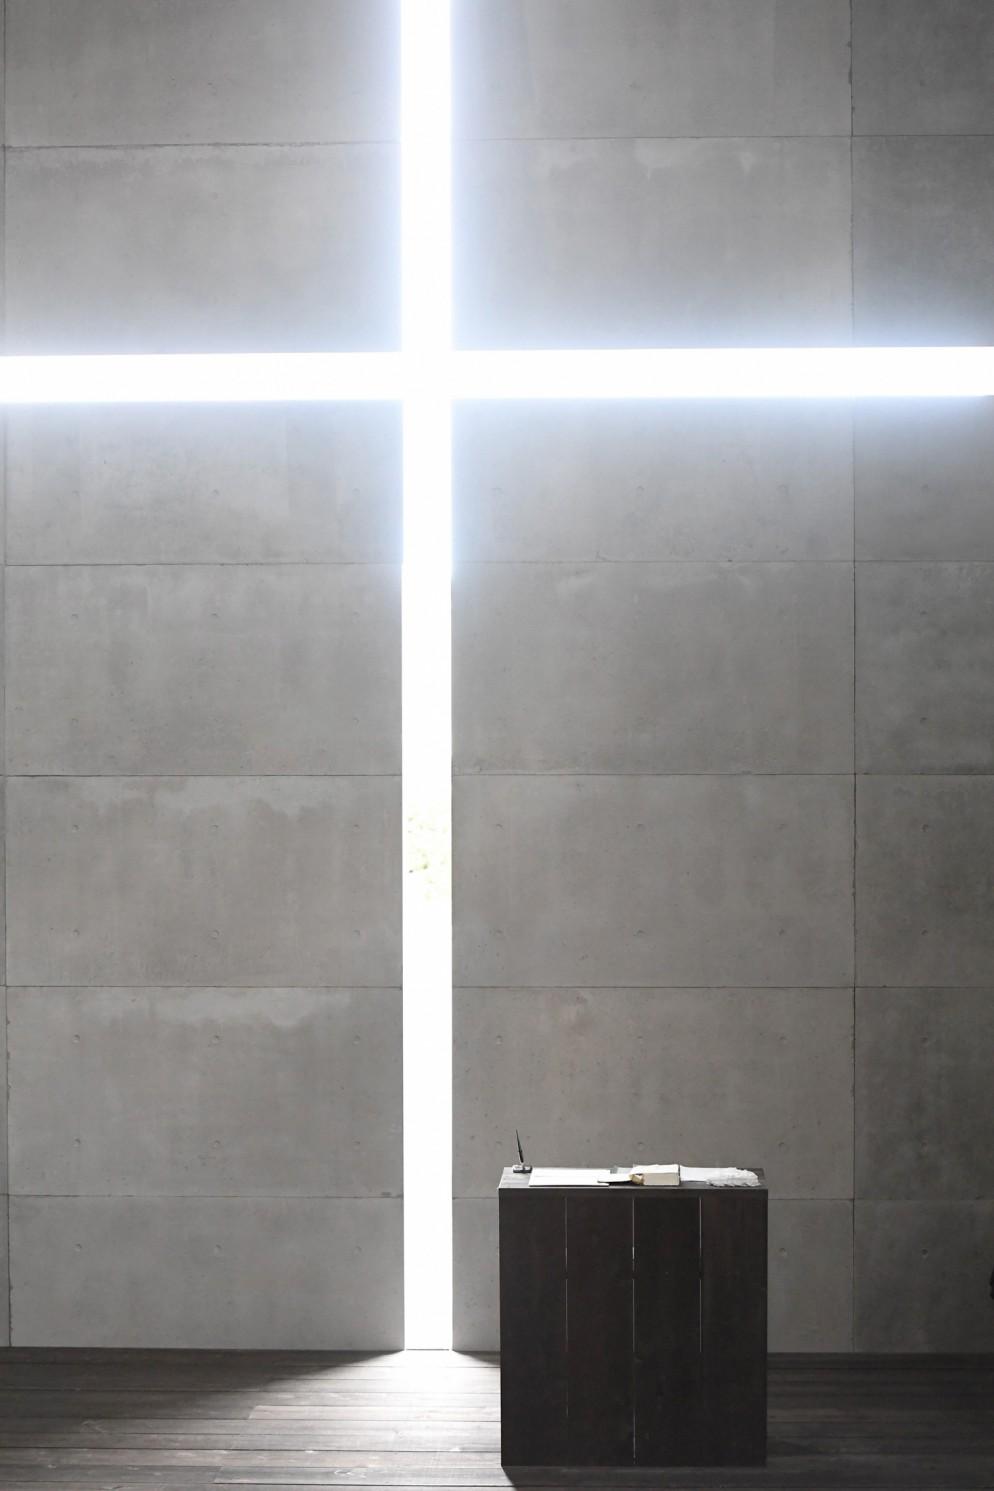 architetti-famosi-Asahi_Shimbun-GettyImages-876733904-living-corriere